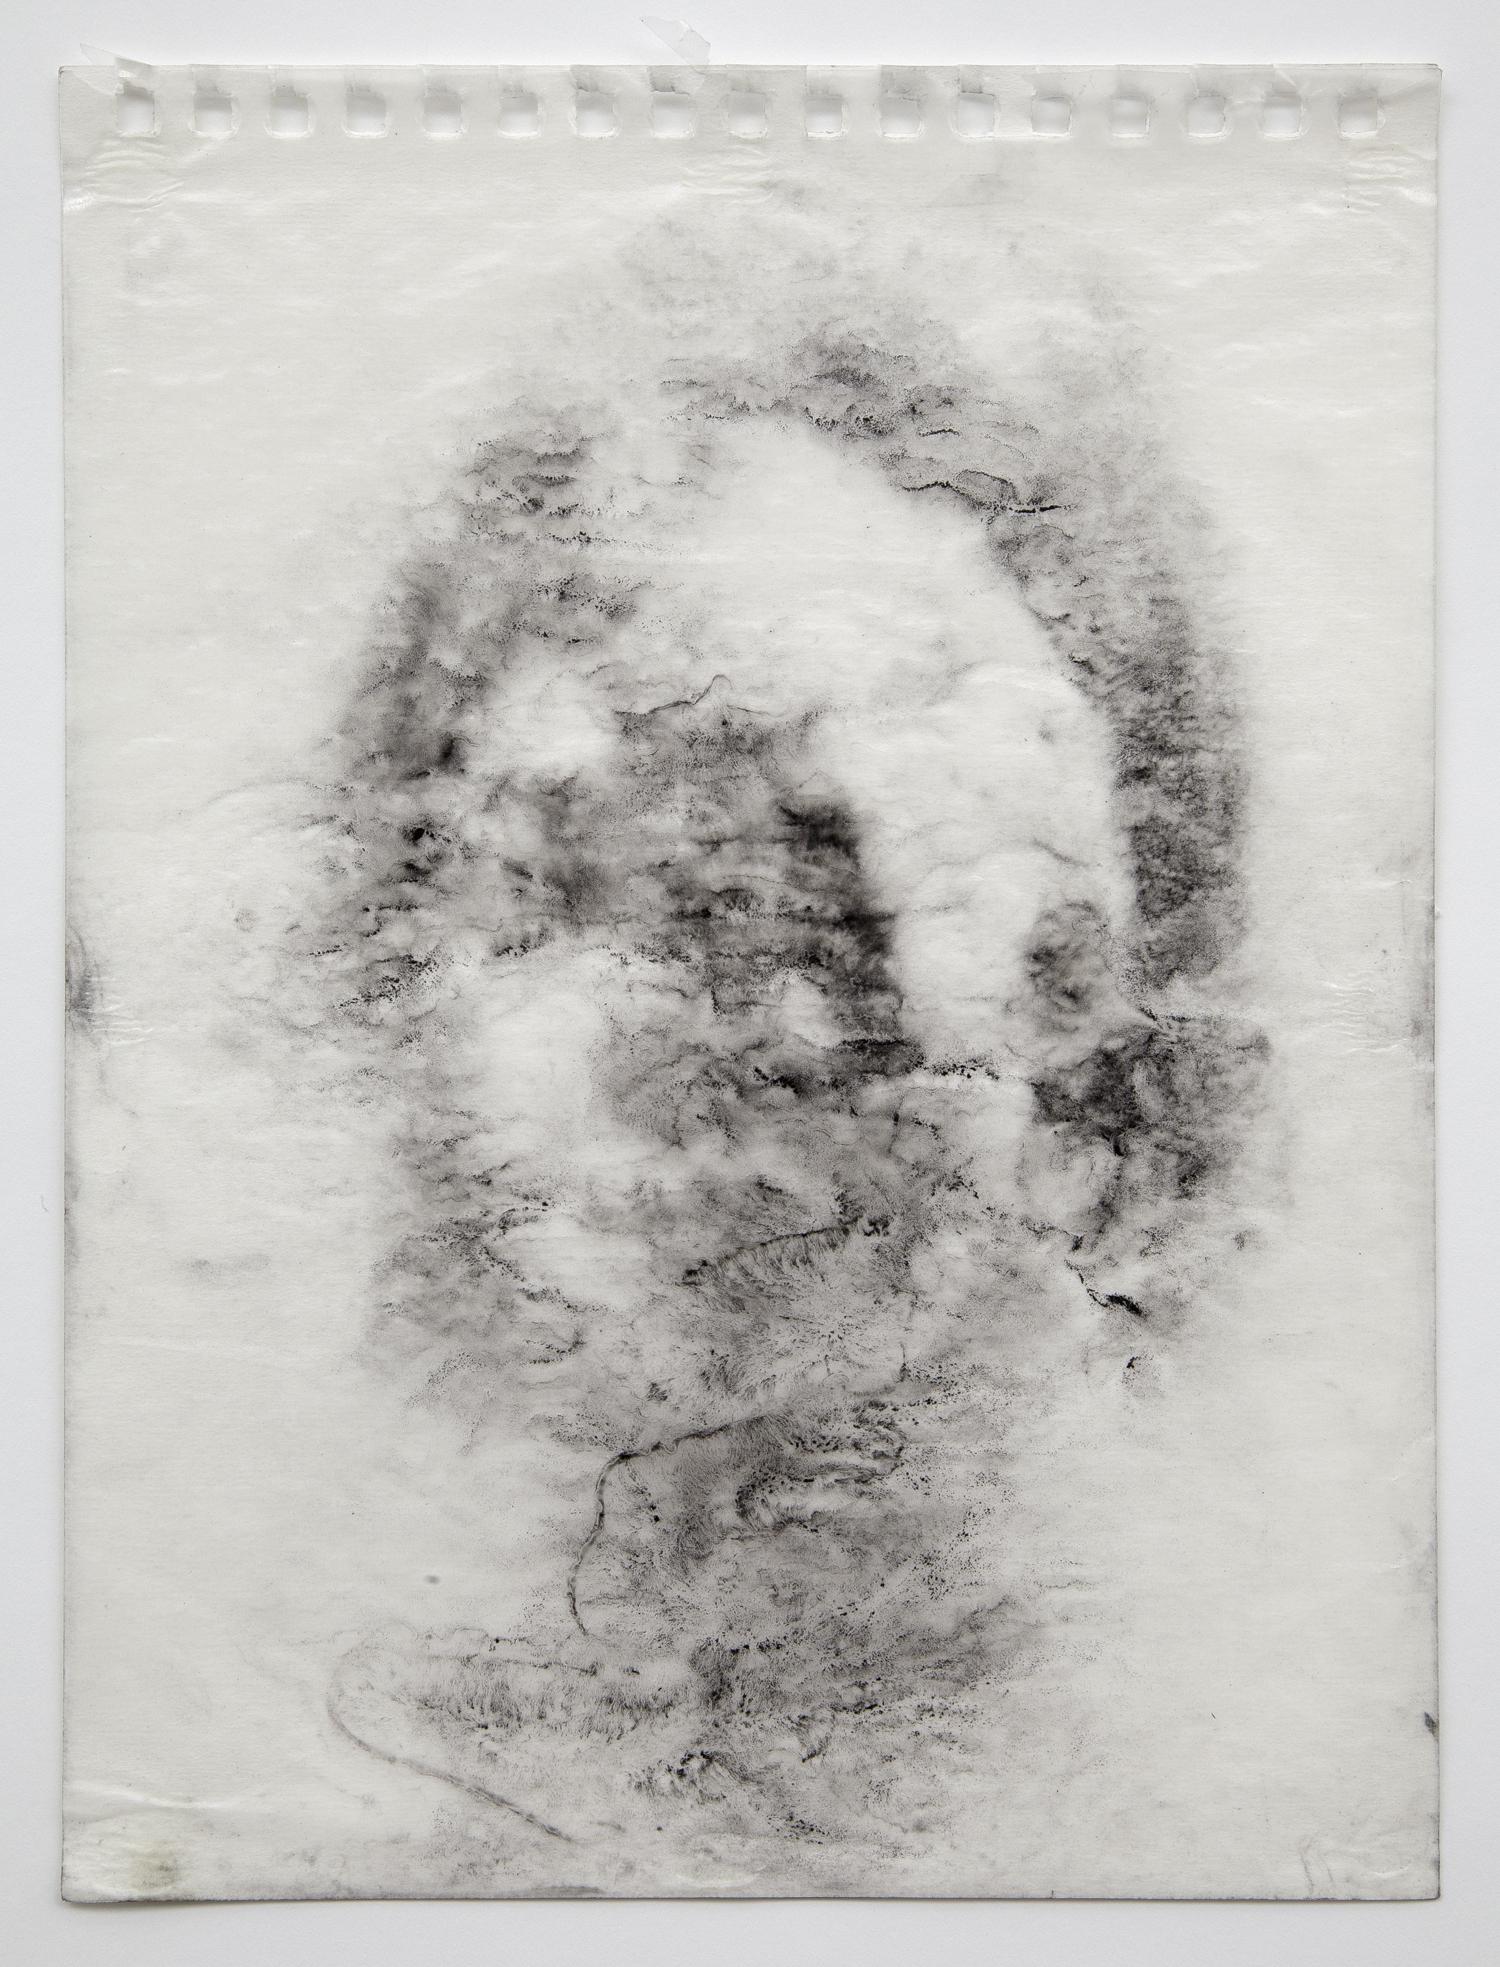 Interleaf Drawing (Roman Head), 2013